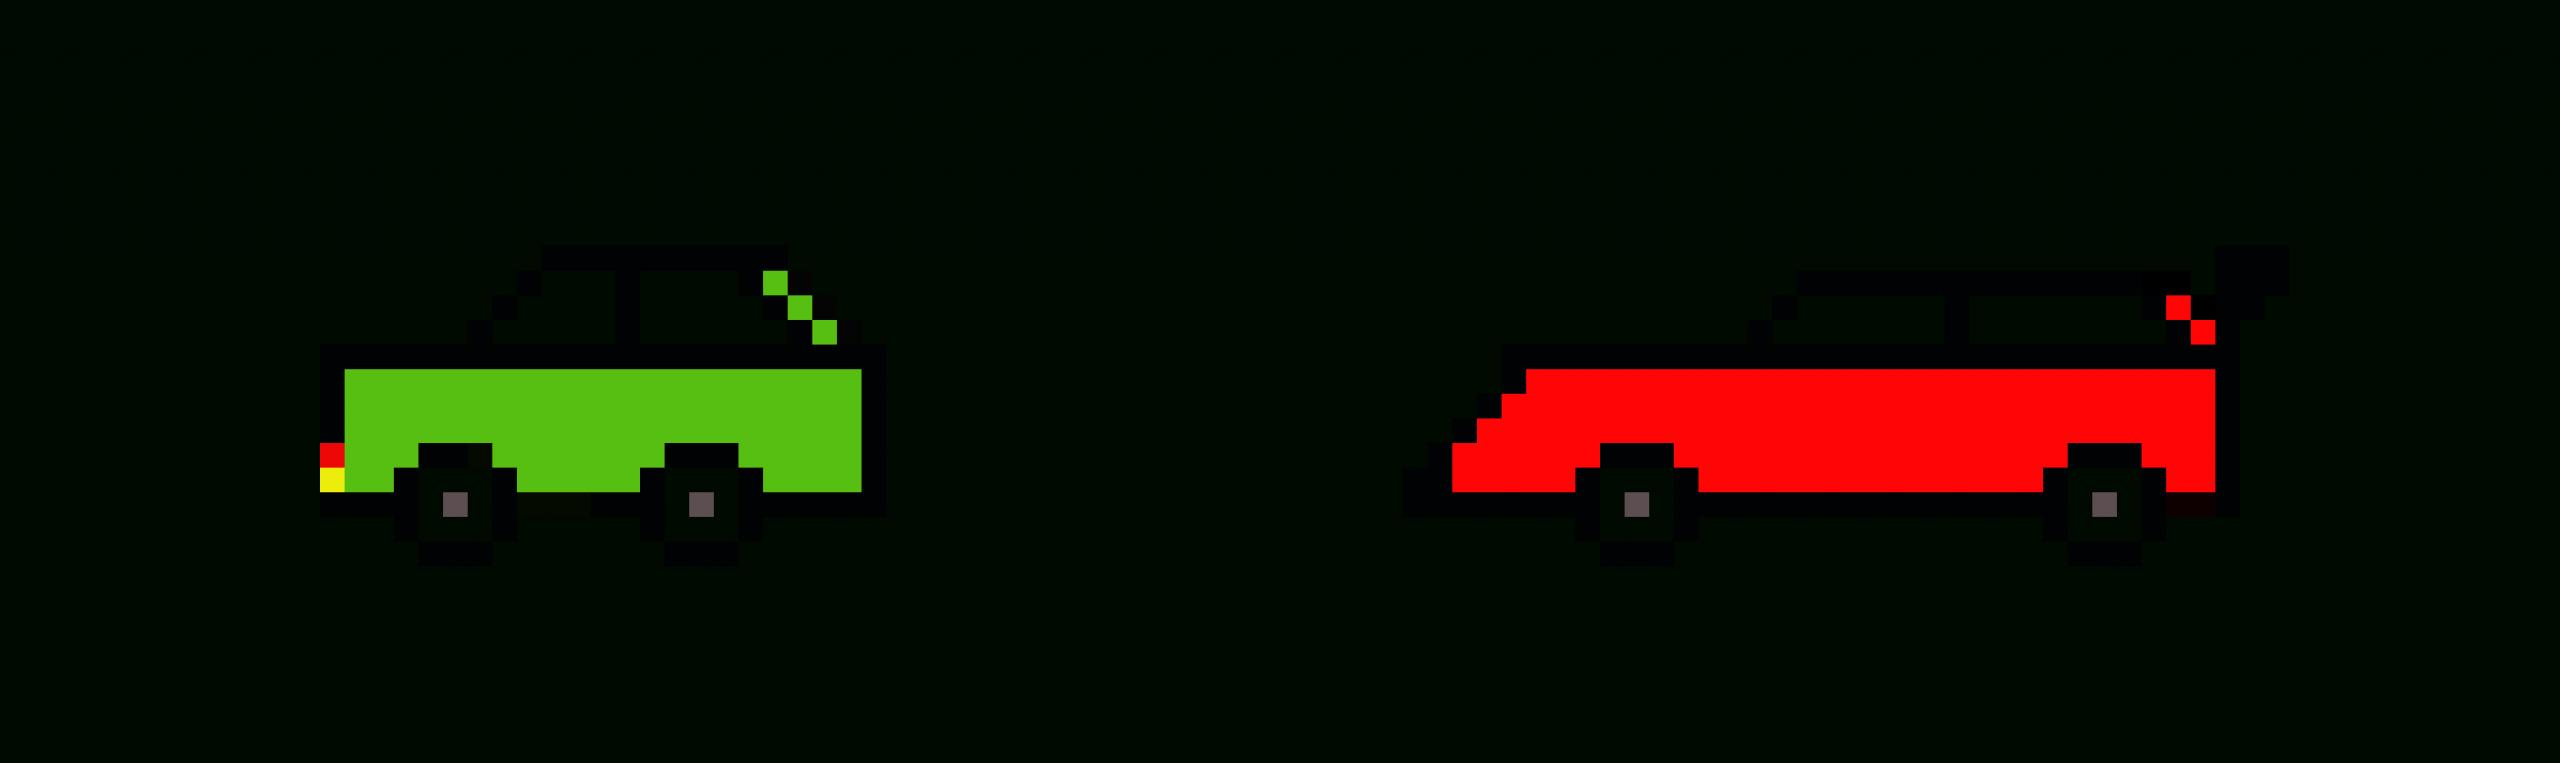 Voiture Jeu | Pixel Art Maker dedans Voiture Pixel Art